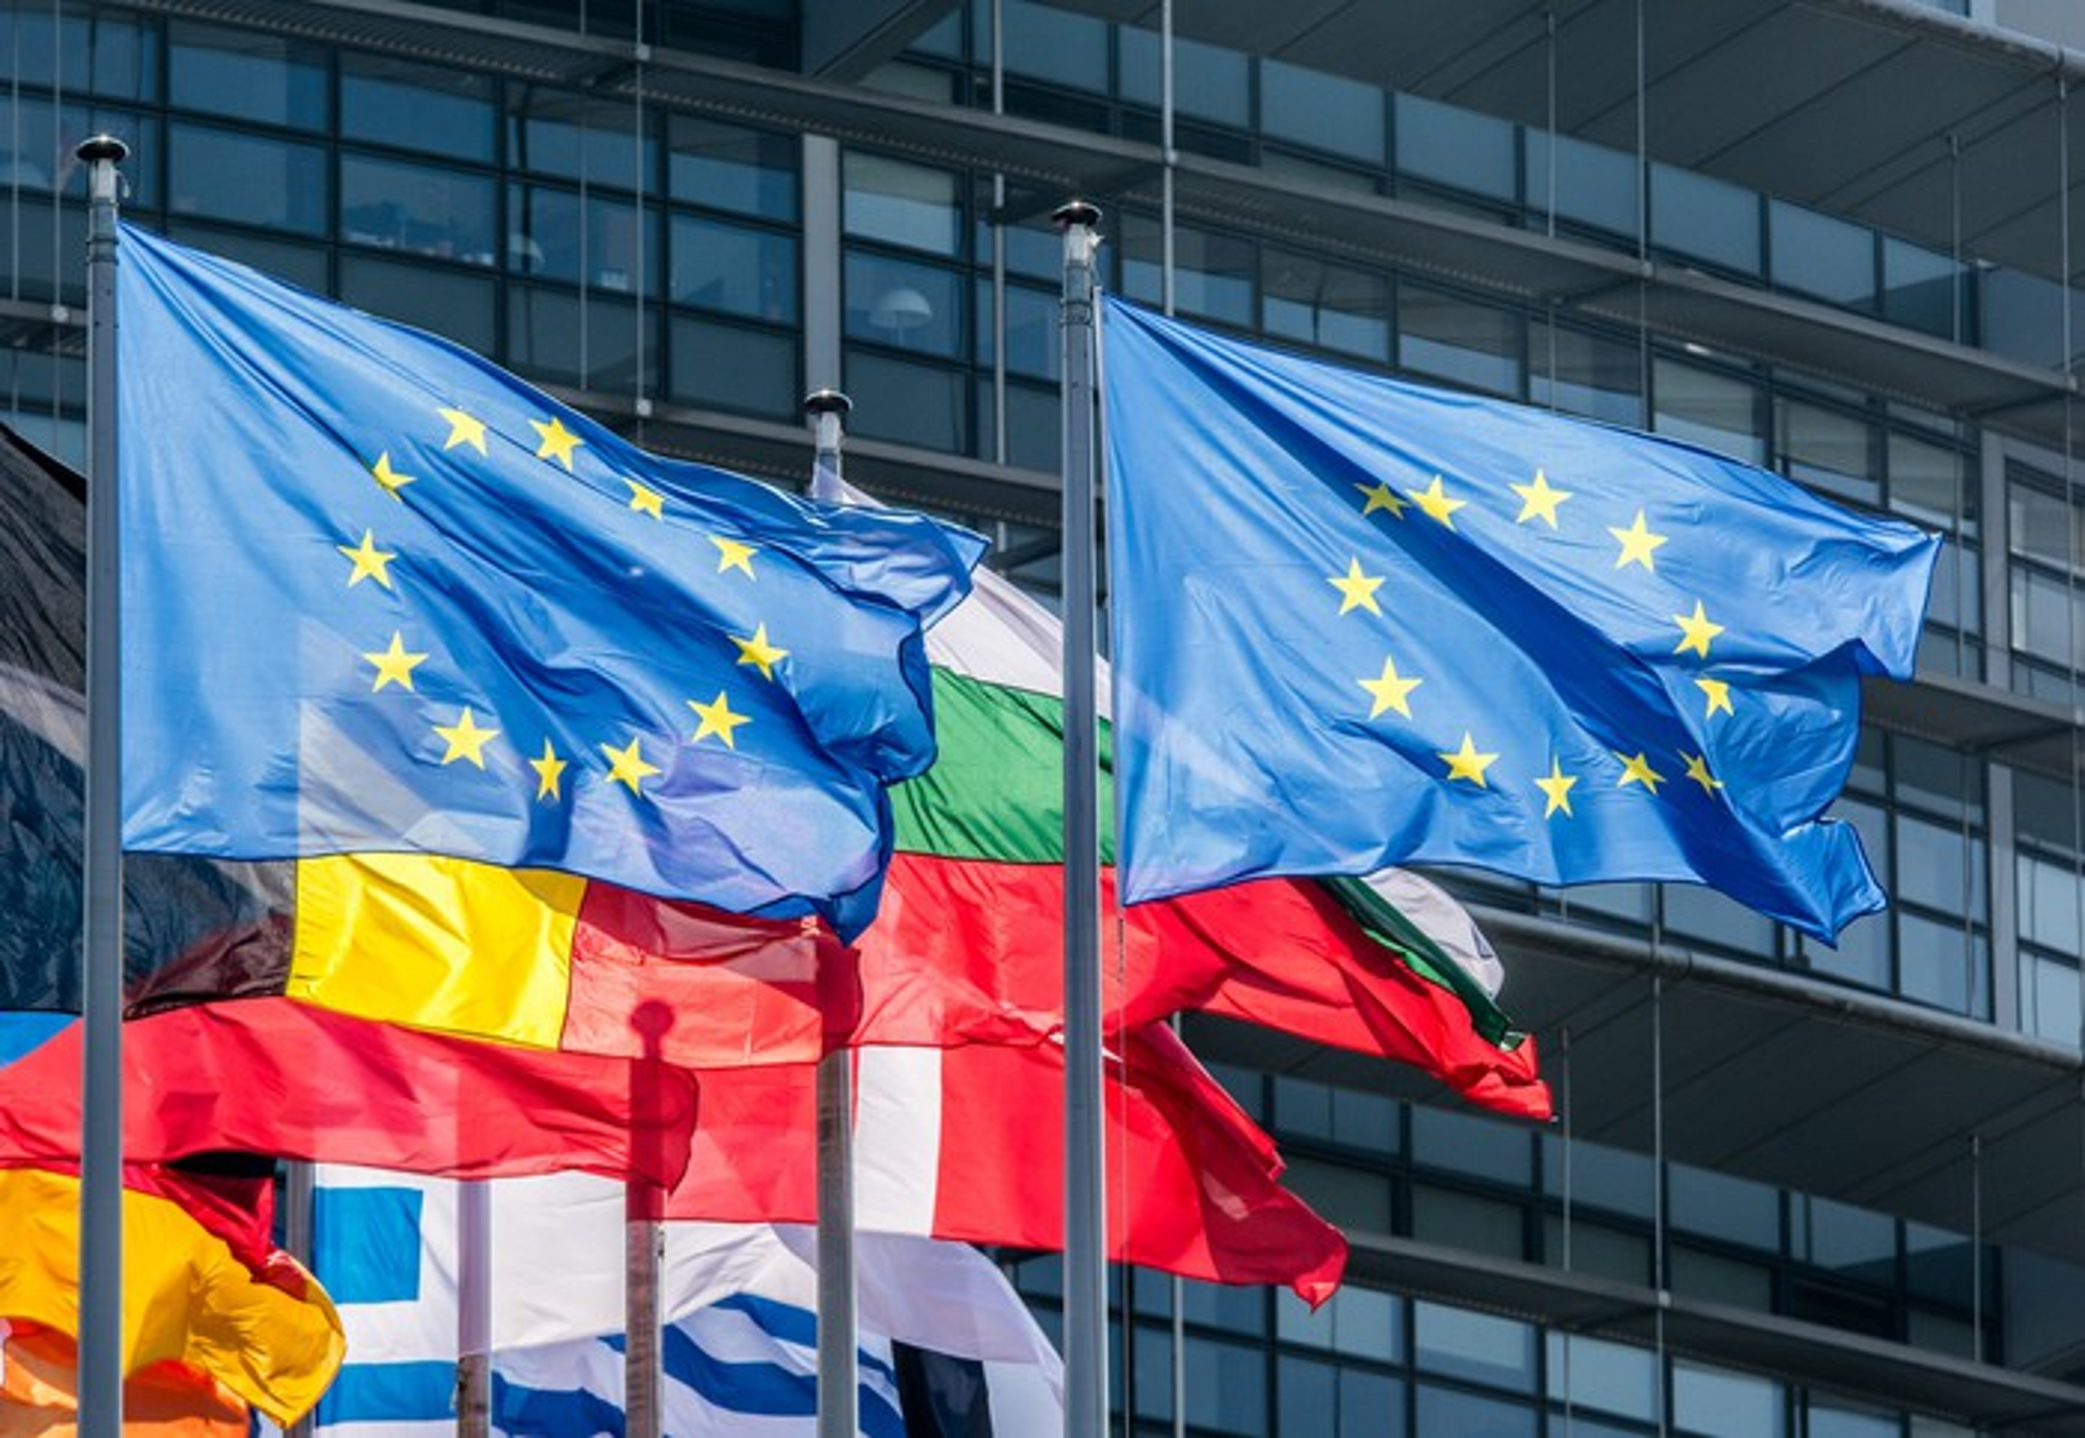 European Union flags outside a building.